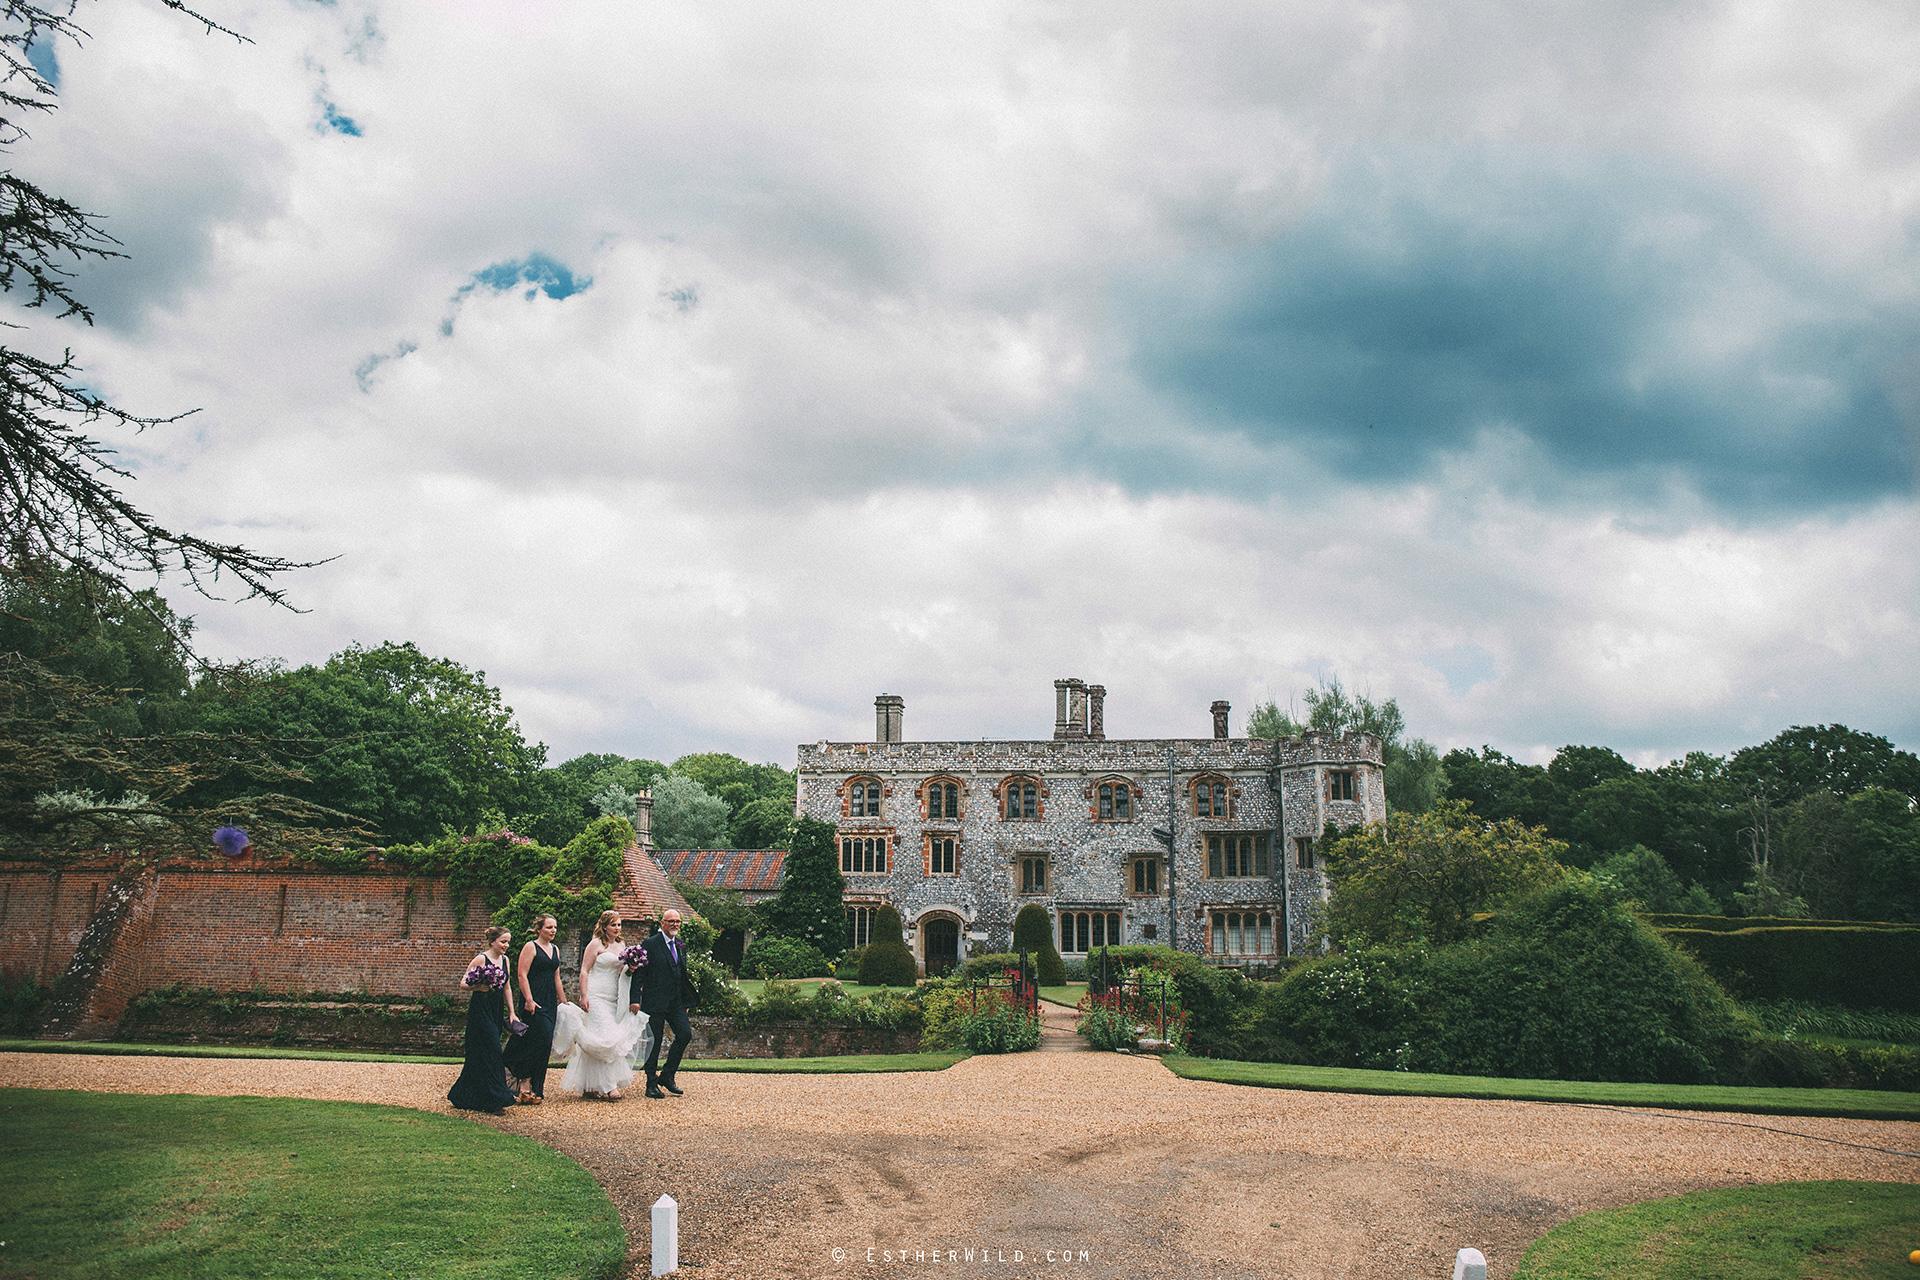 Norfolk_Wedding_Photographer_Mannington_Hall_Country_Esther_Wild_0889.jpg